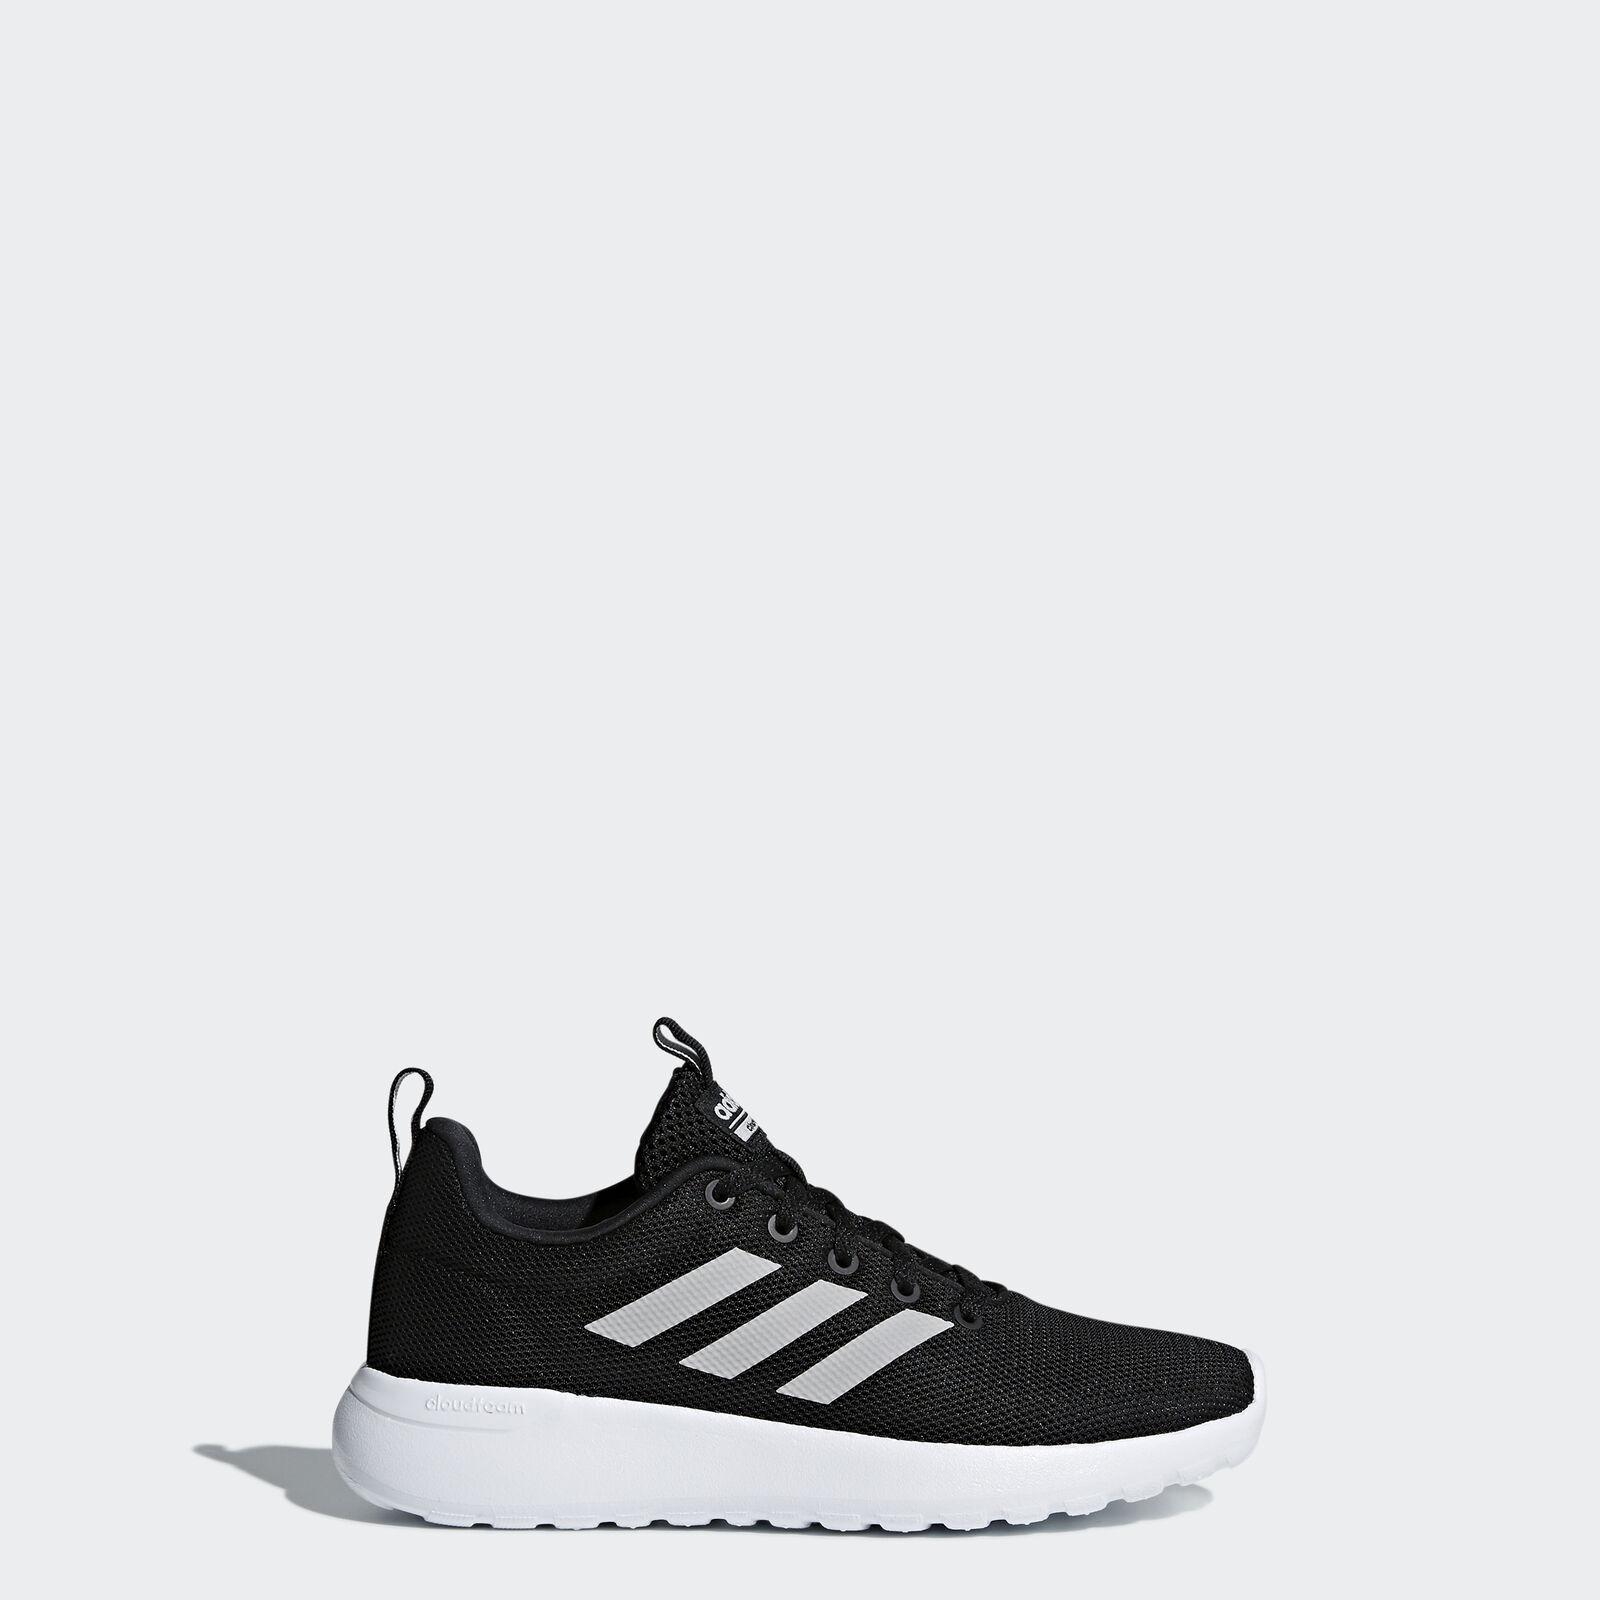 adidas Unisex-Child Lite Racer CLN Running Shoe for sale online ...